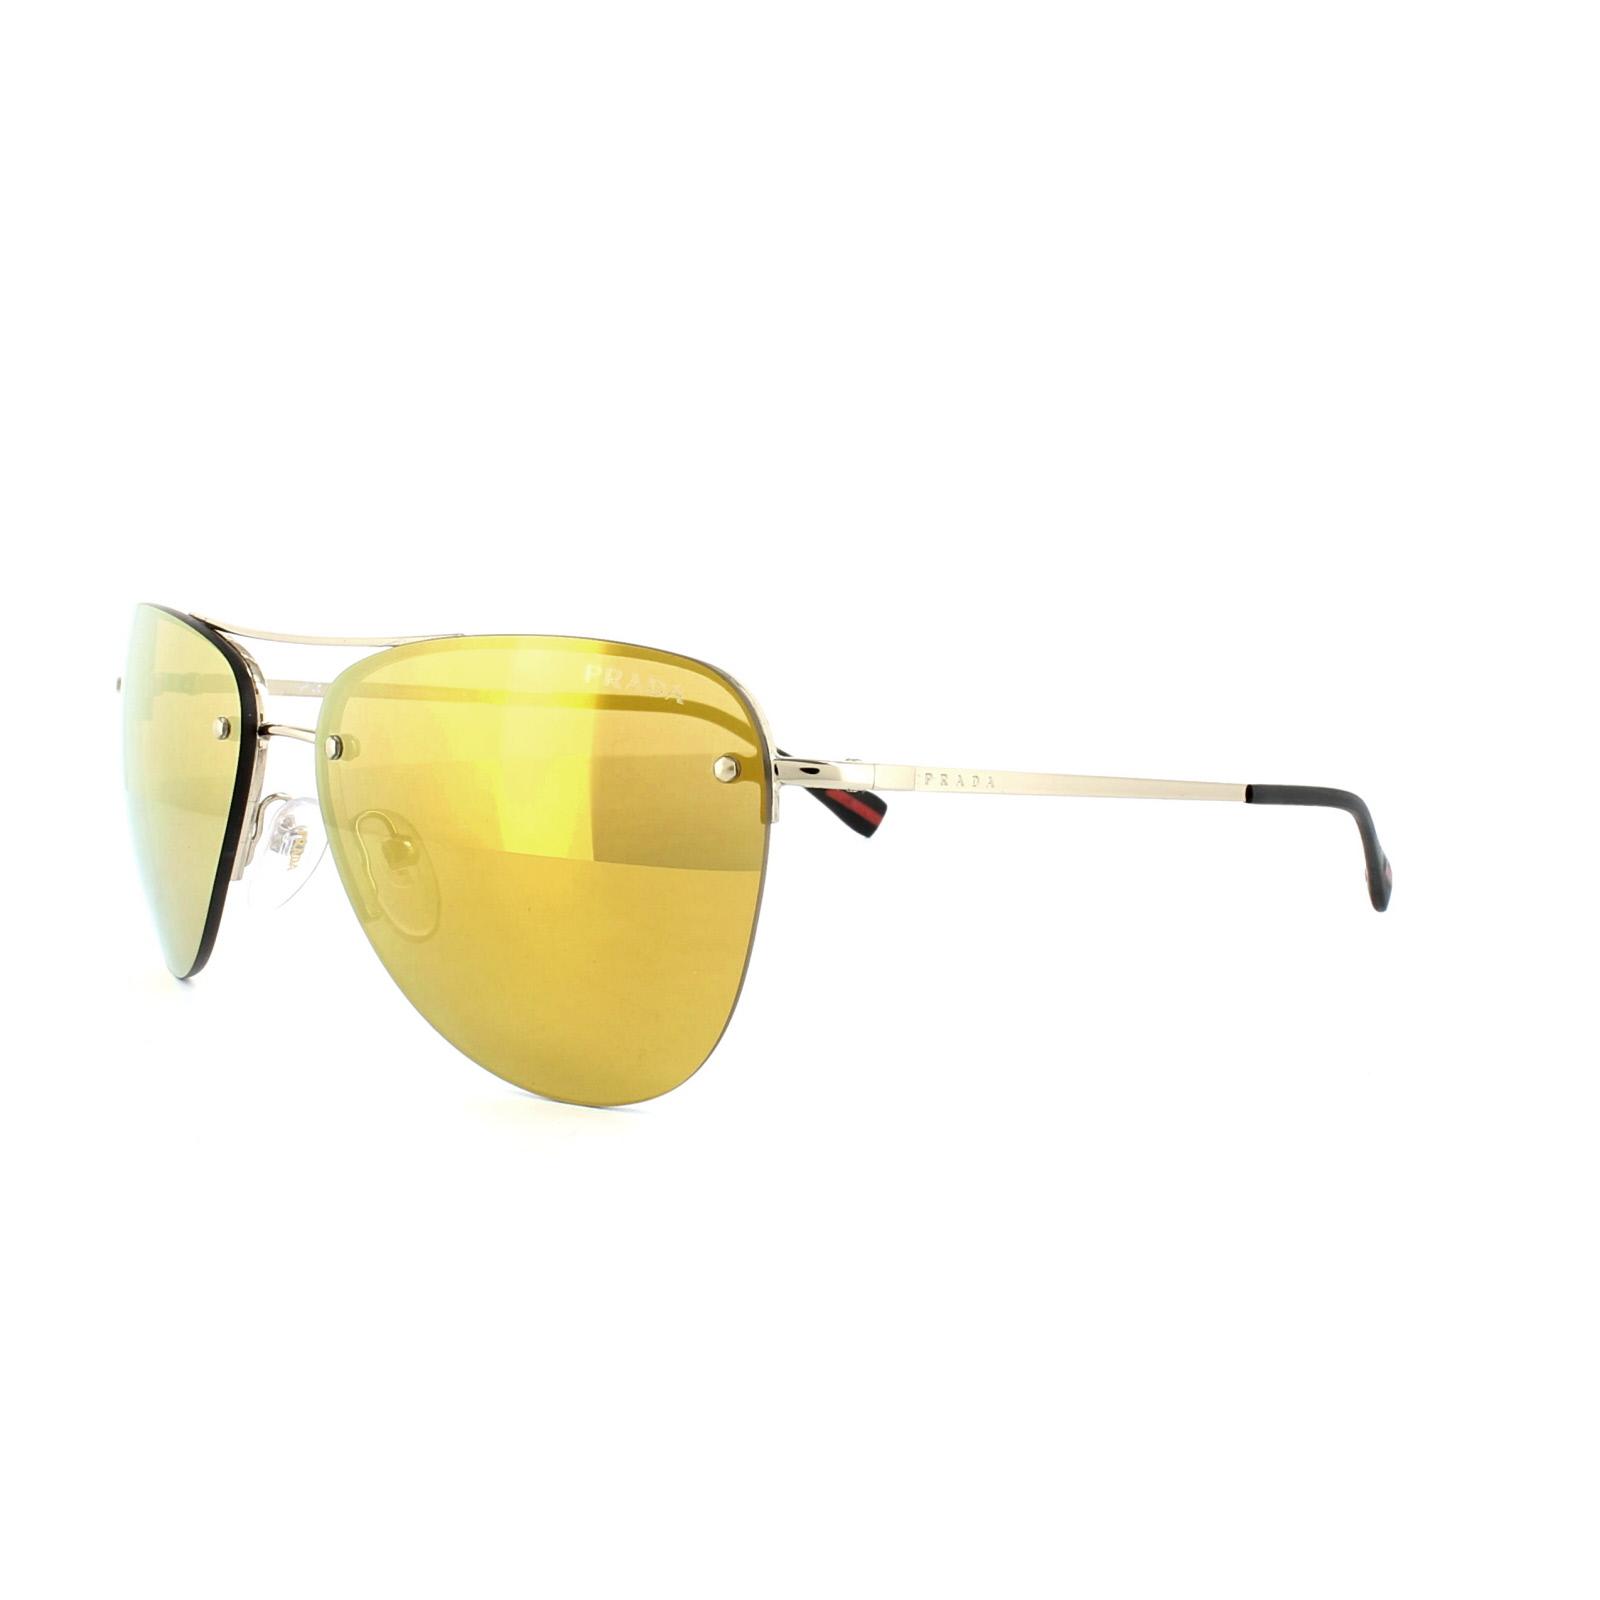 ac7671ce29ef Sentinel Prada Sport Sunglasses 53RS ZVN5N0 Pale Gold Gold Mirror